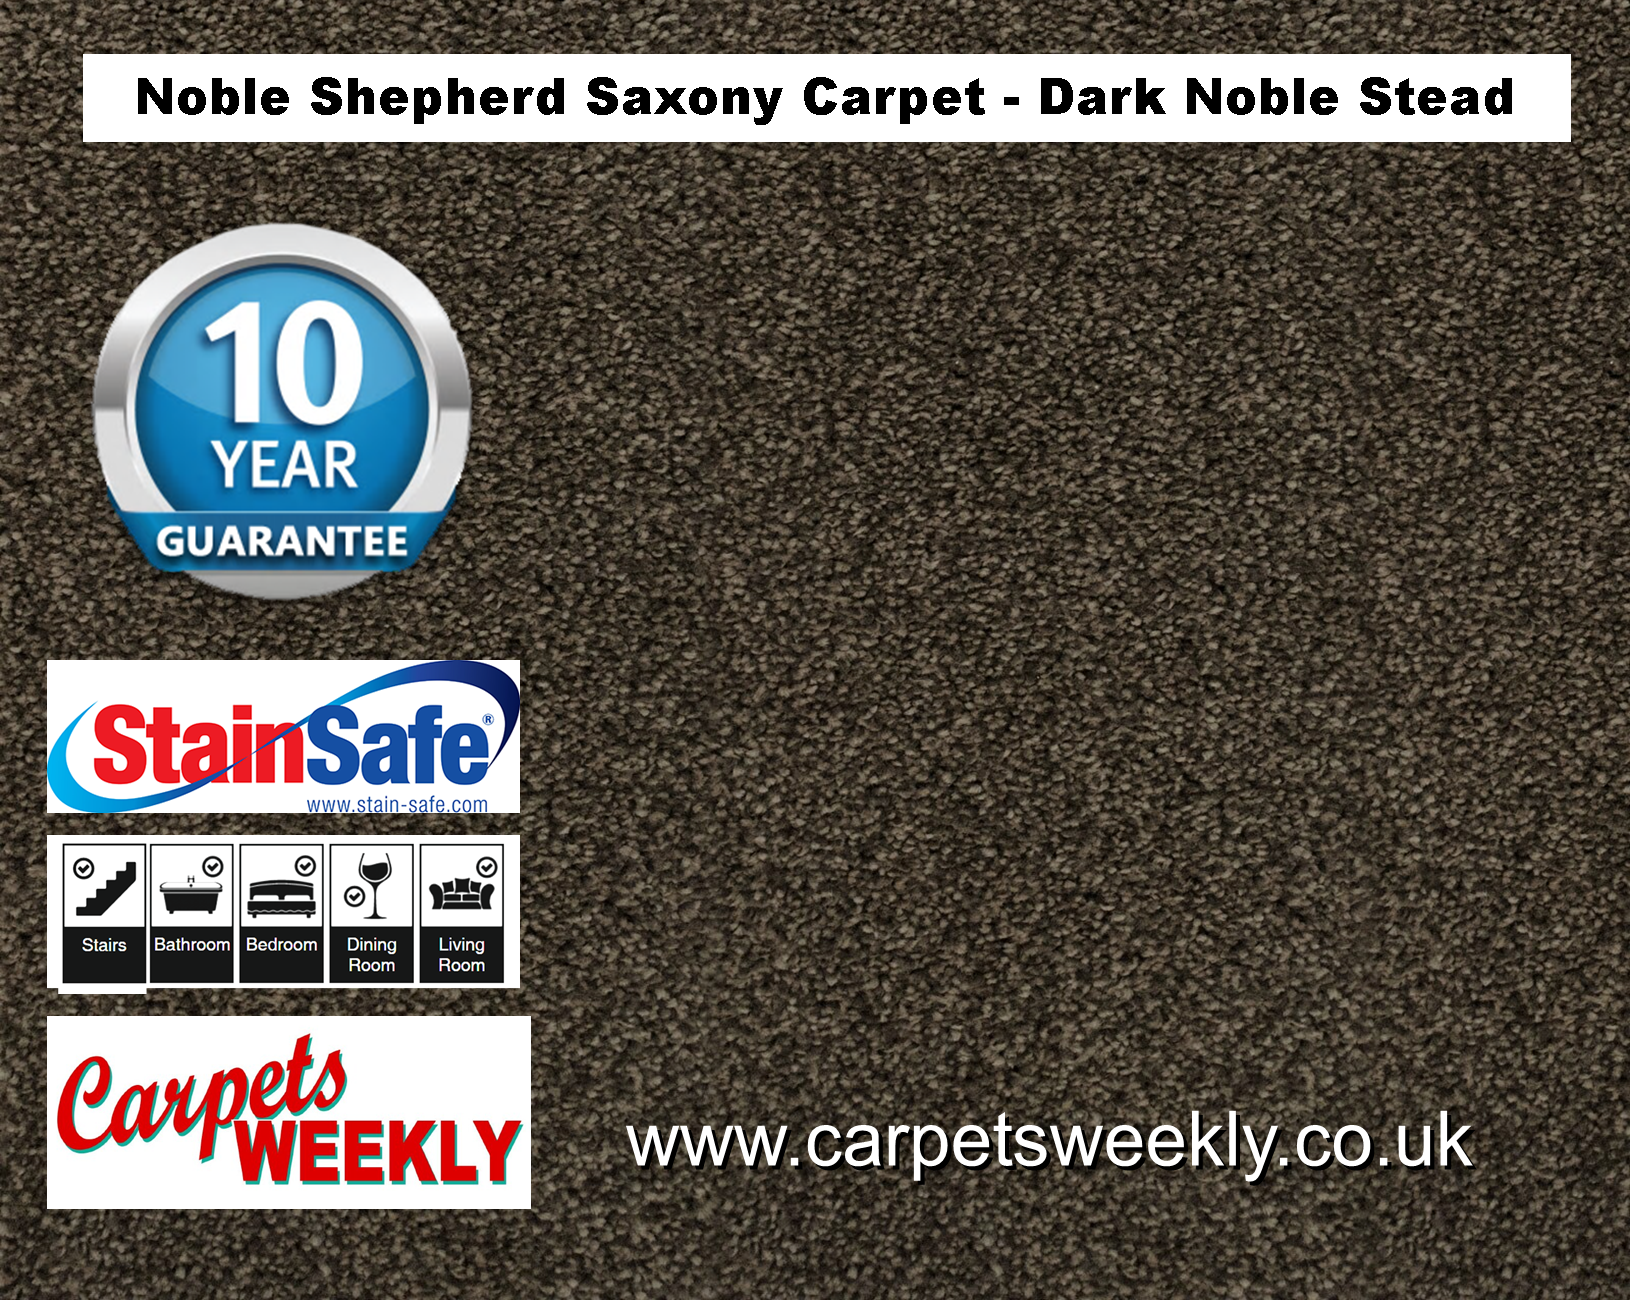 Noble Shepherd Saxony Carpet from Carpets Weekly Dark Noble Stead (880)